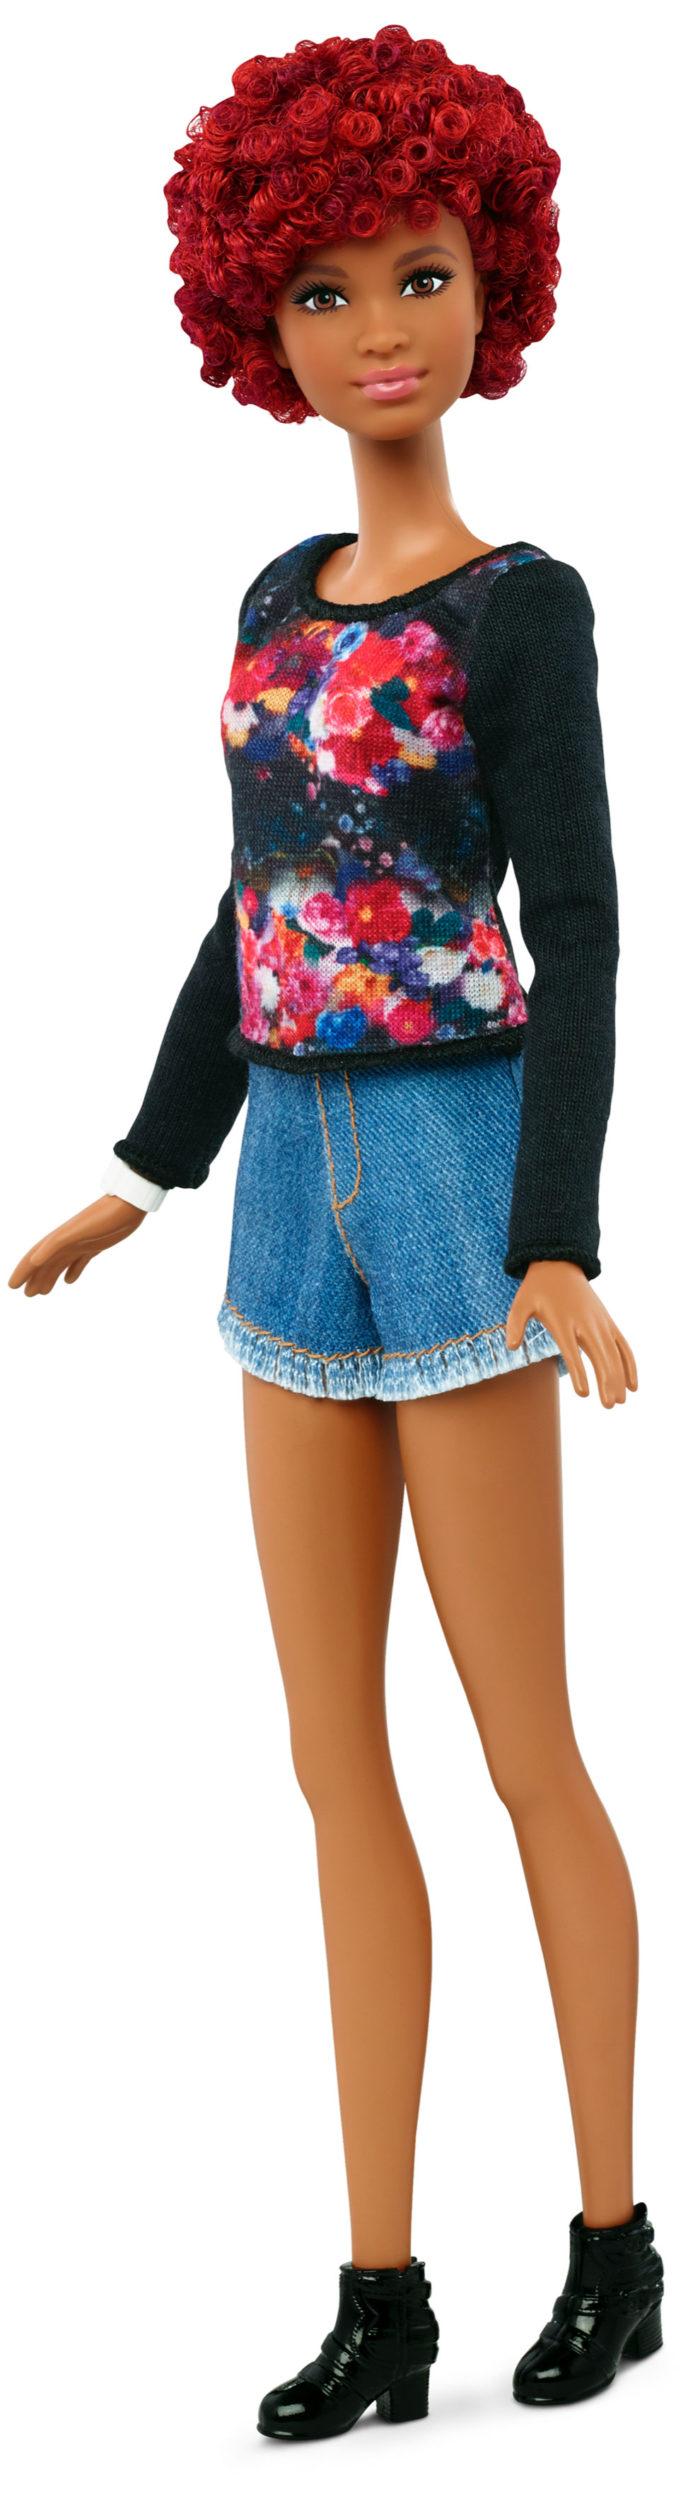 barbie-nuove-curvy-bassa-alta-realistica-10